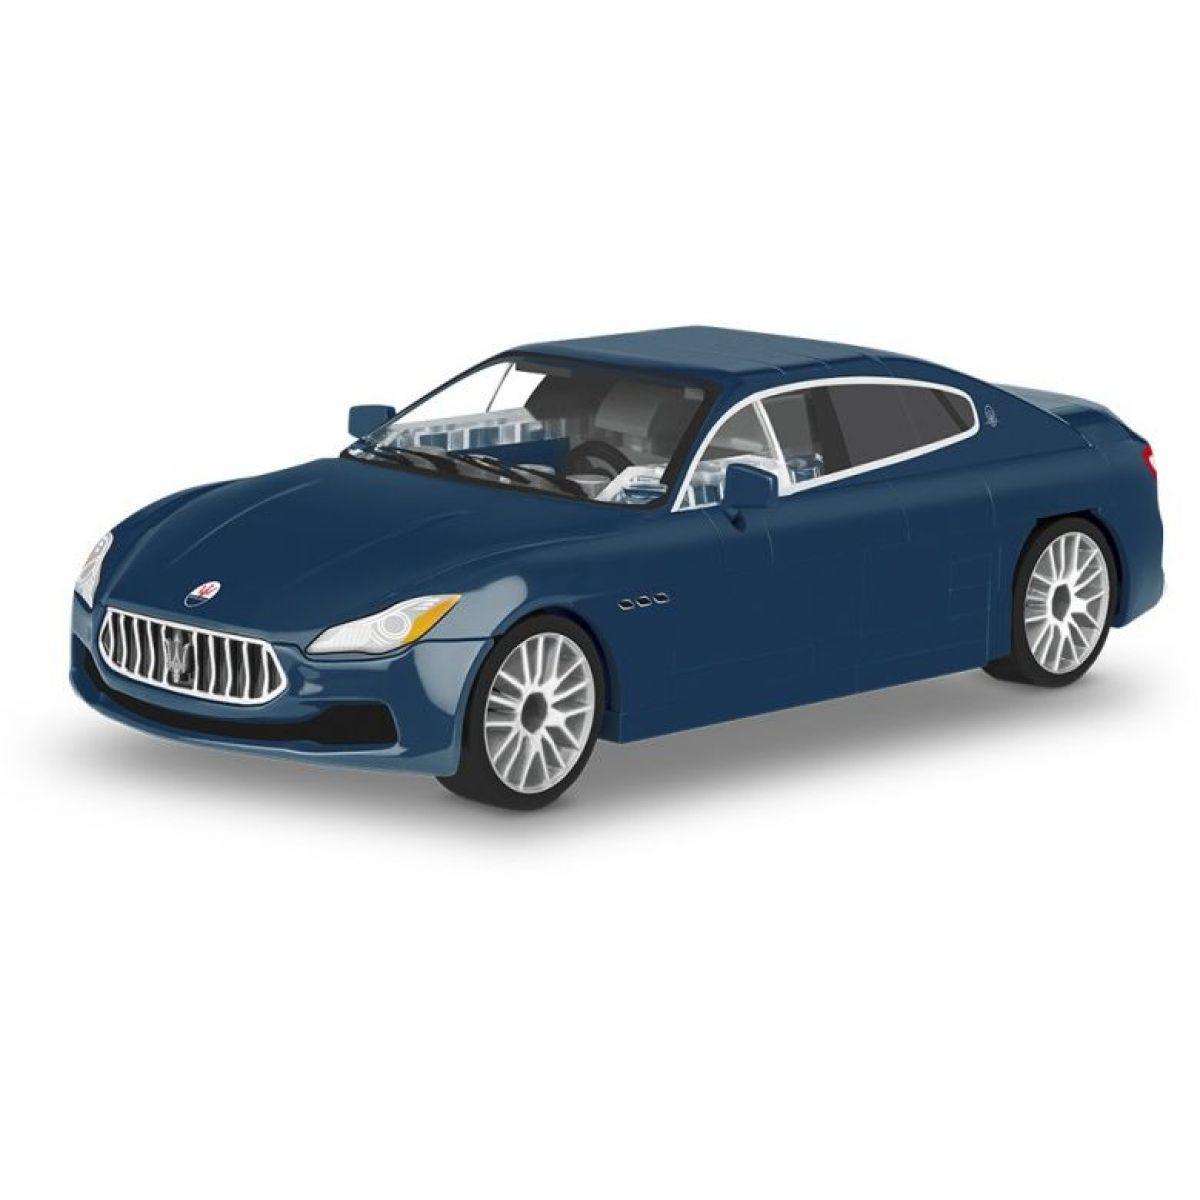 Cobi 24563 Maserati Quattroporte 109 dielikov